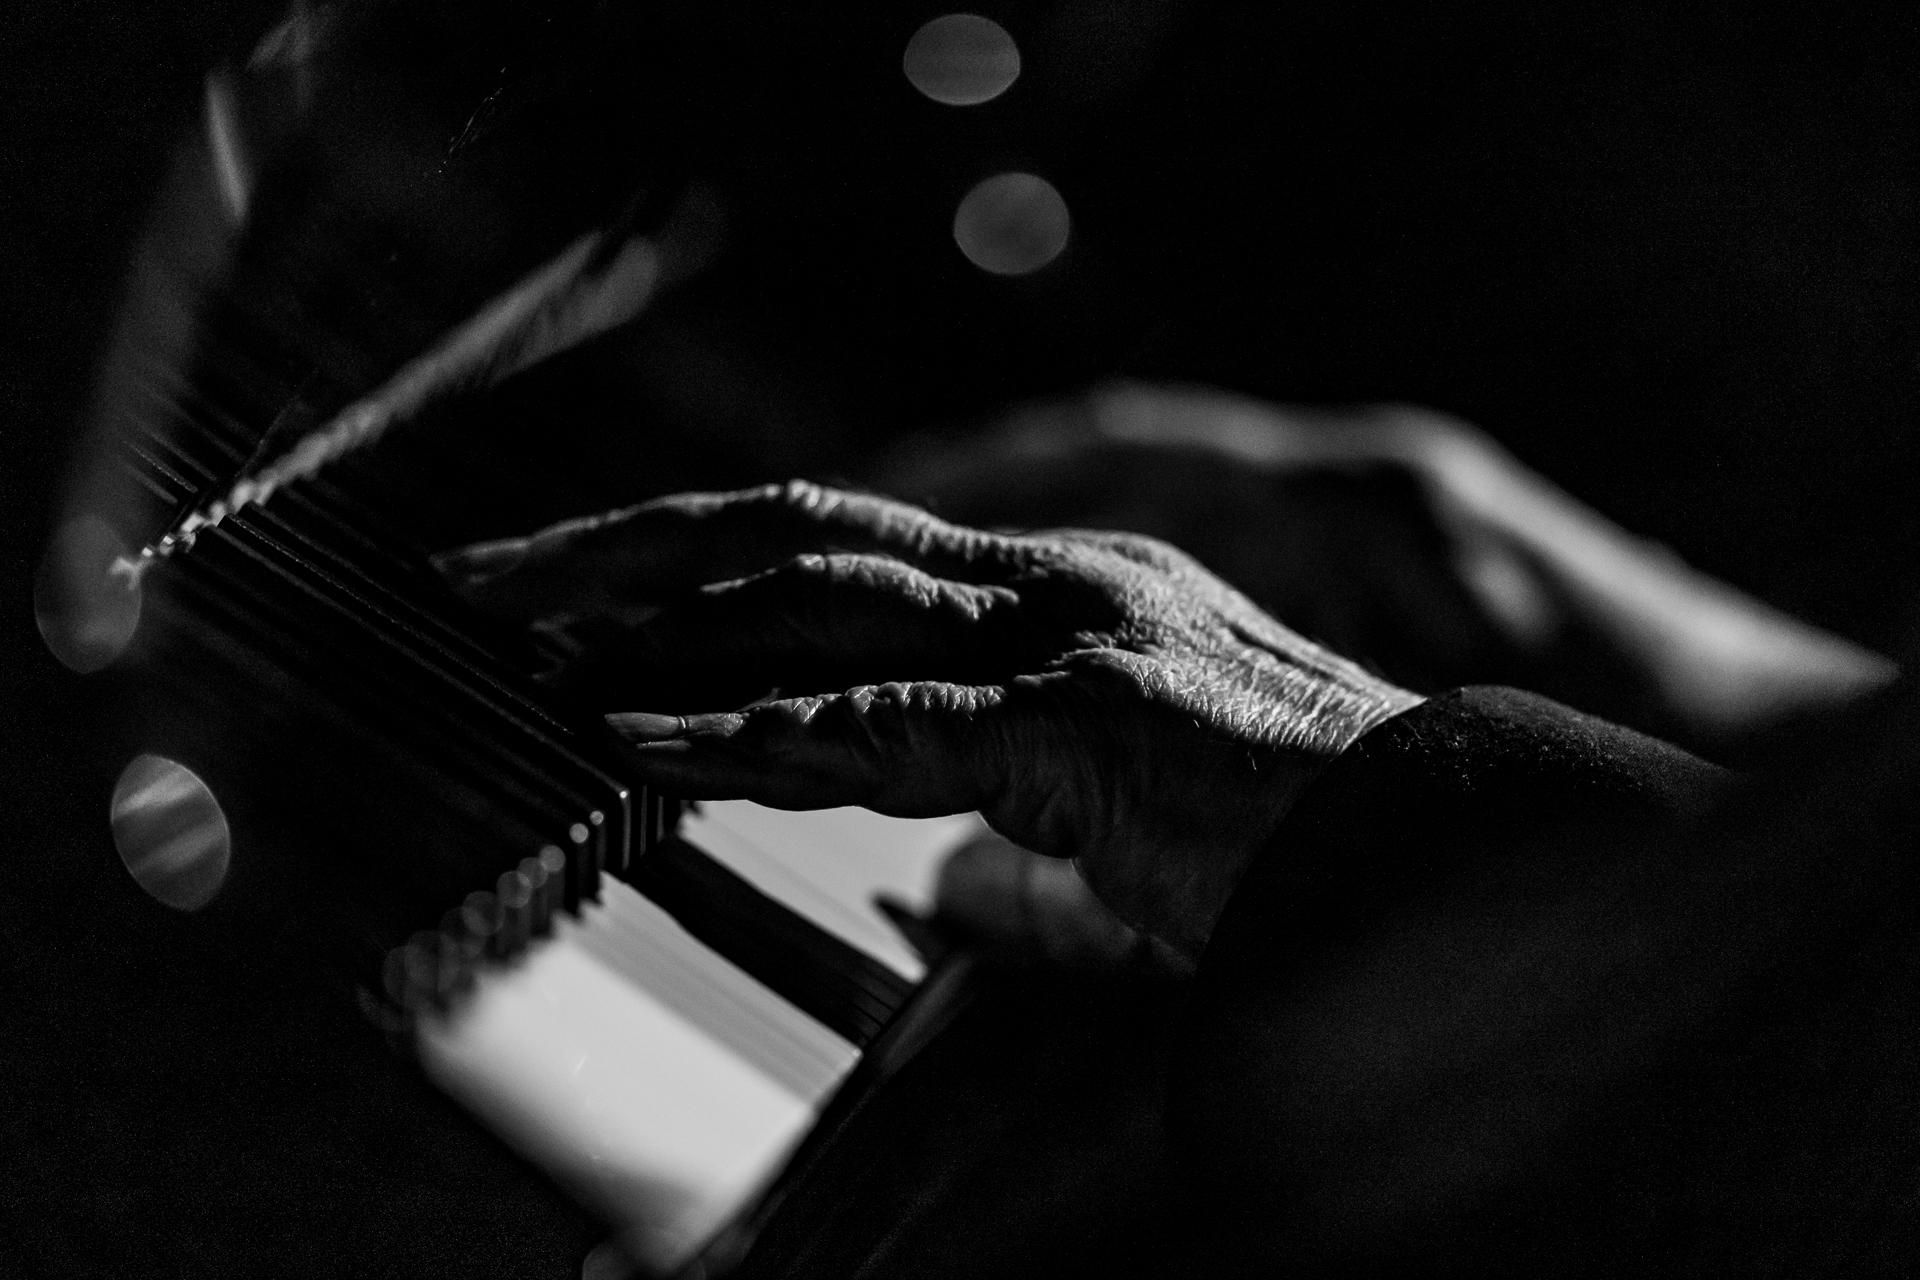 2018_11_06-©LKV-Steve-Kuhn-Trio-220914-5D4B0154